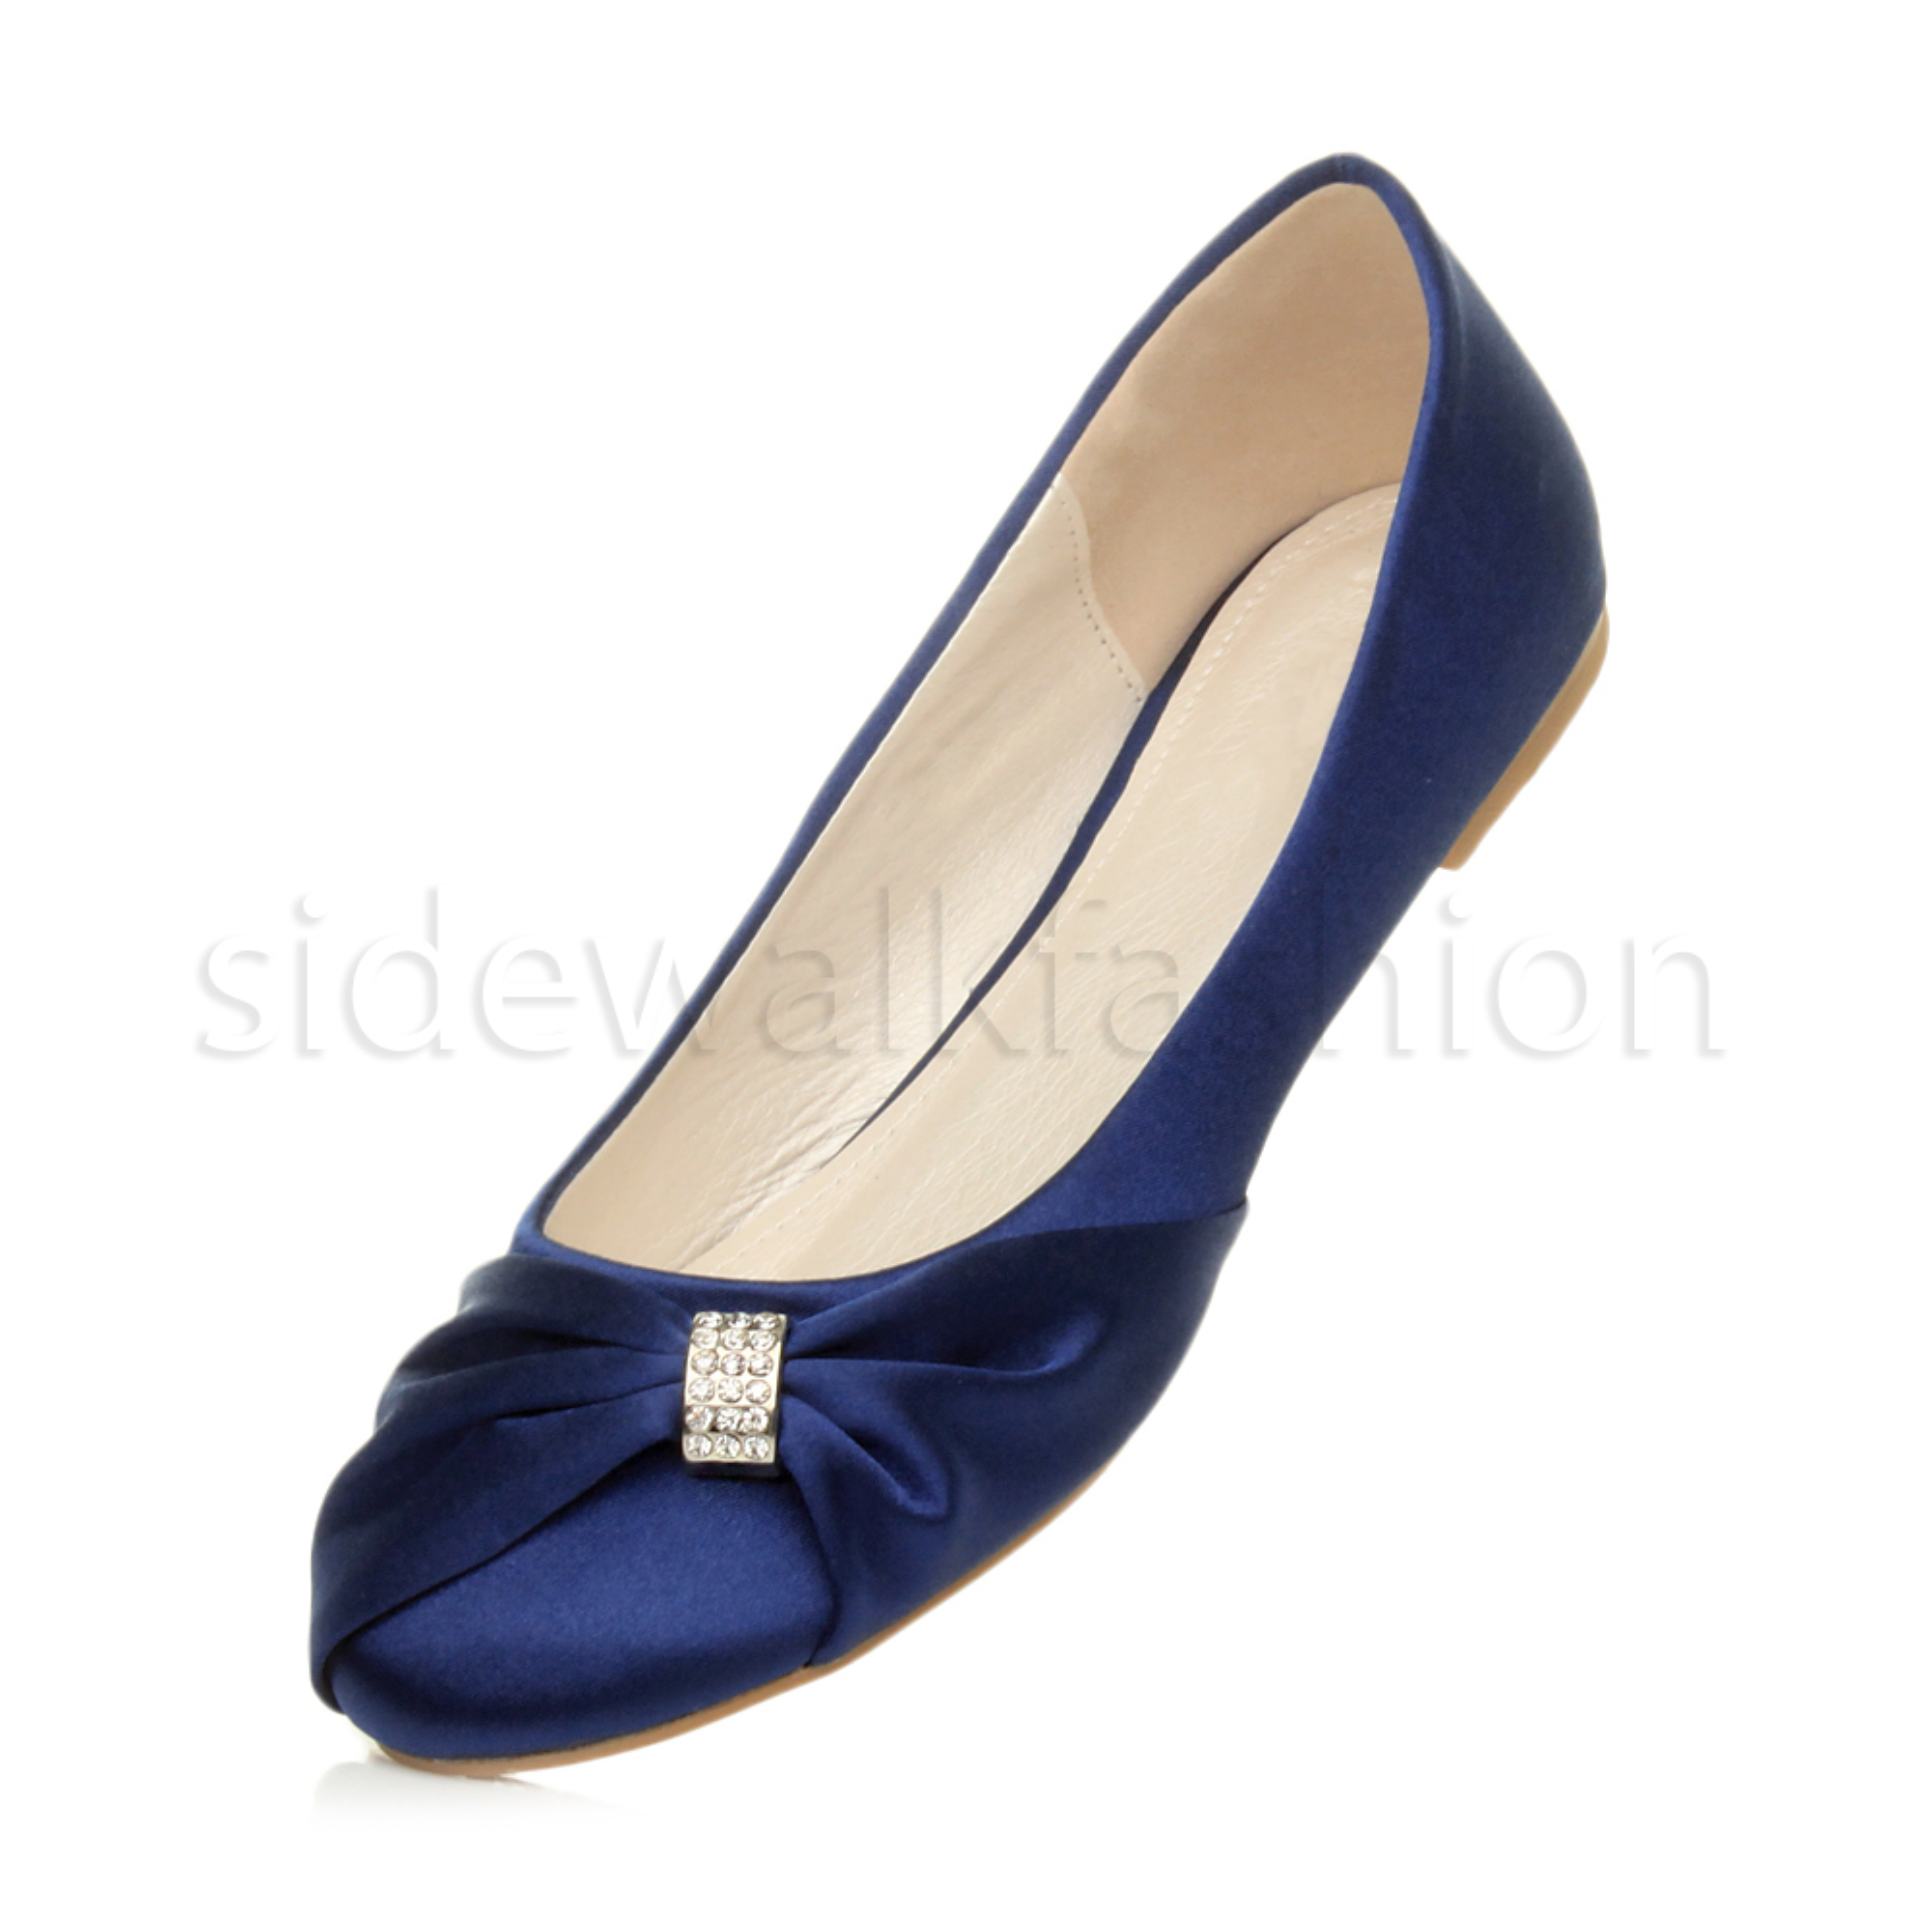 Womens-ladies-flat-wedding-bridesmaid-ruched-diamante-bridal-shoes-pumps-size thumbnail 24